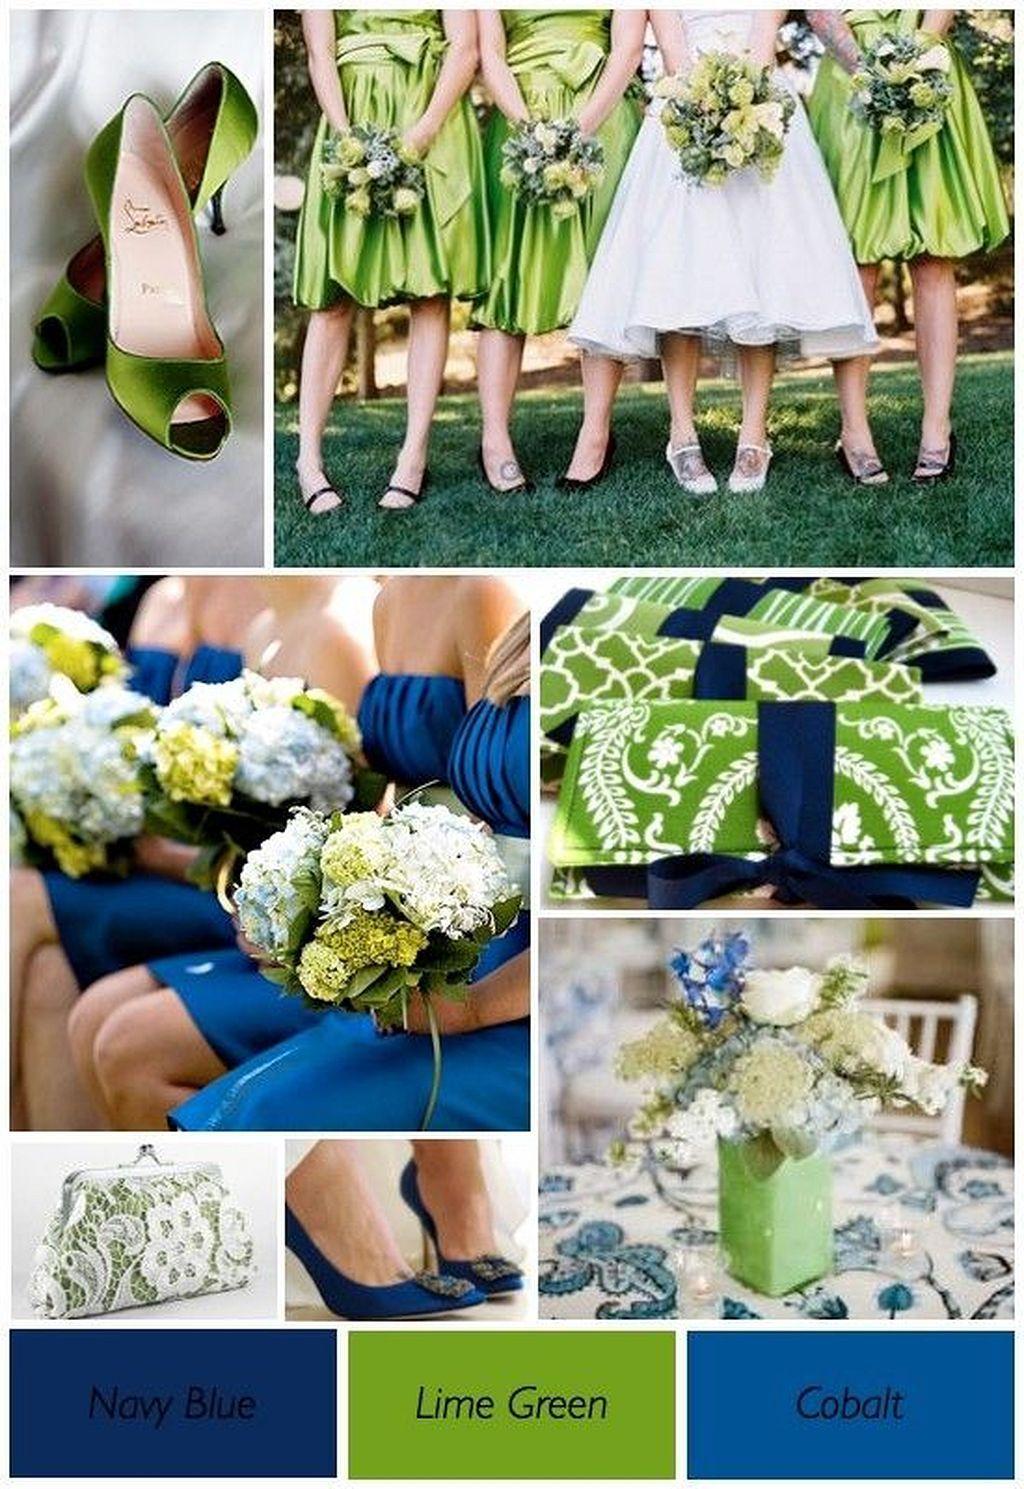 Gorgeous 108 Navy Blue Wedding Theme Ideas Httpsweddmagz108